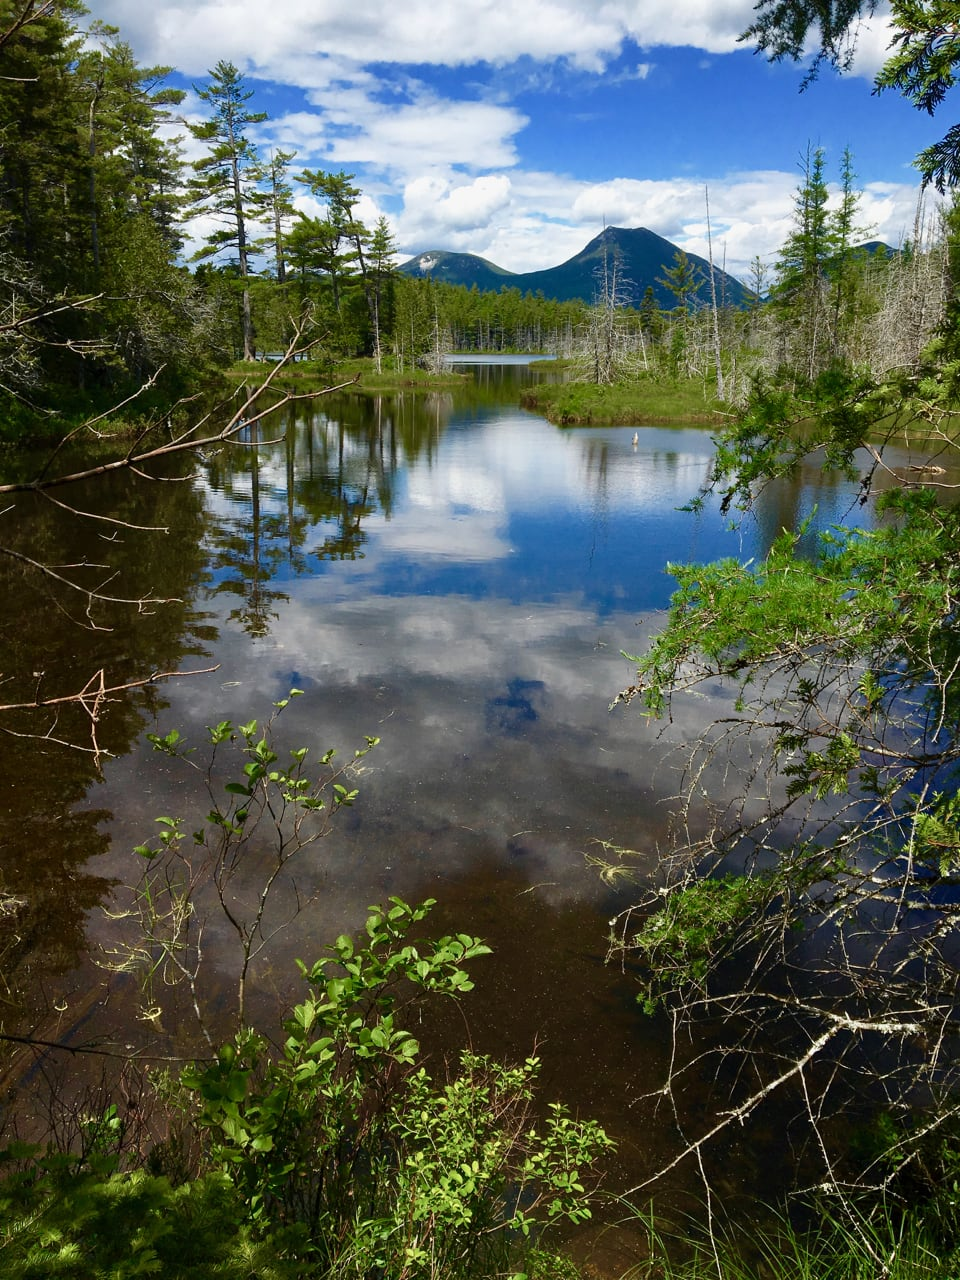 Grassy Pond in Baxter State Park